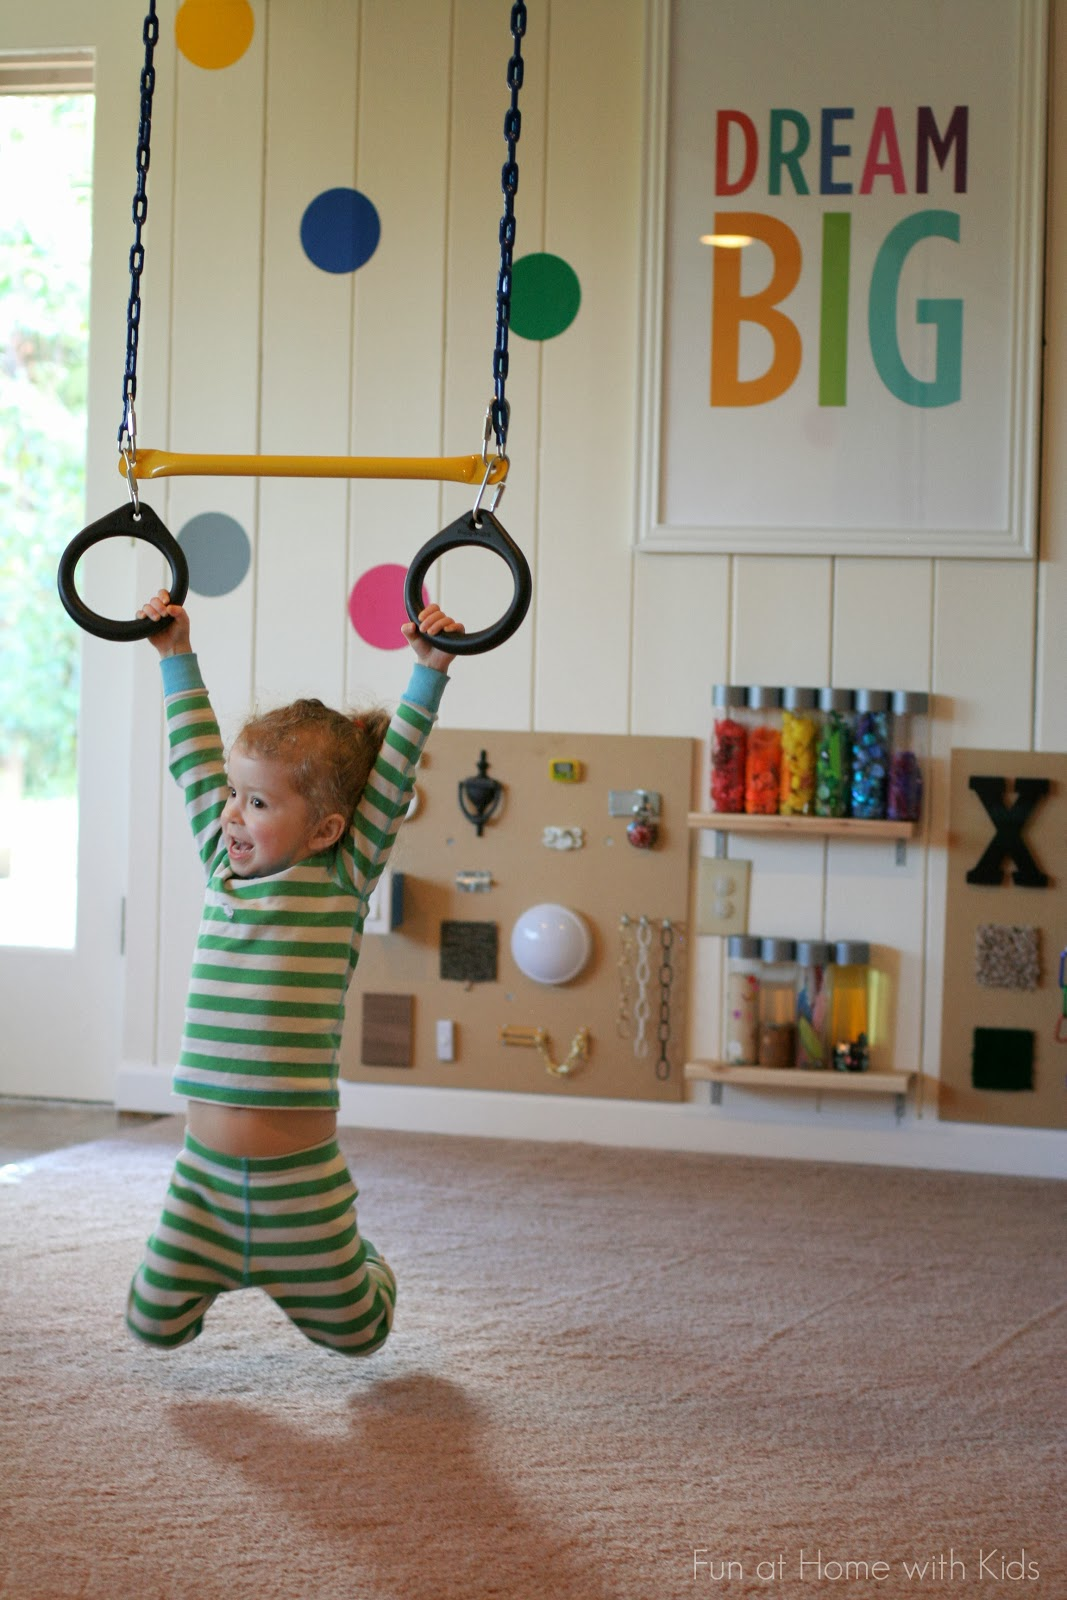 Playroom: Playroom Design: DIY Playroom With Rock Wall